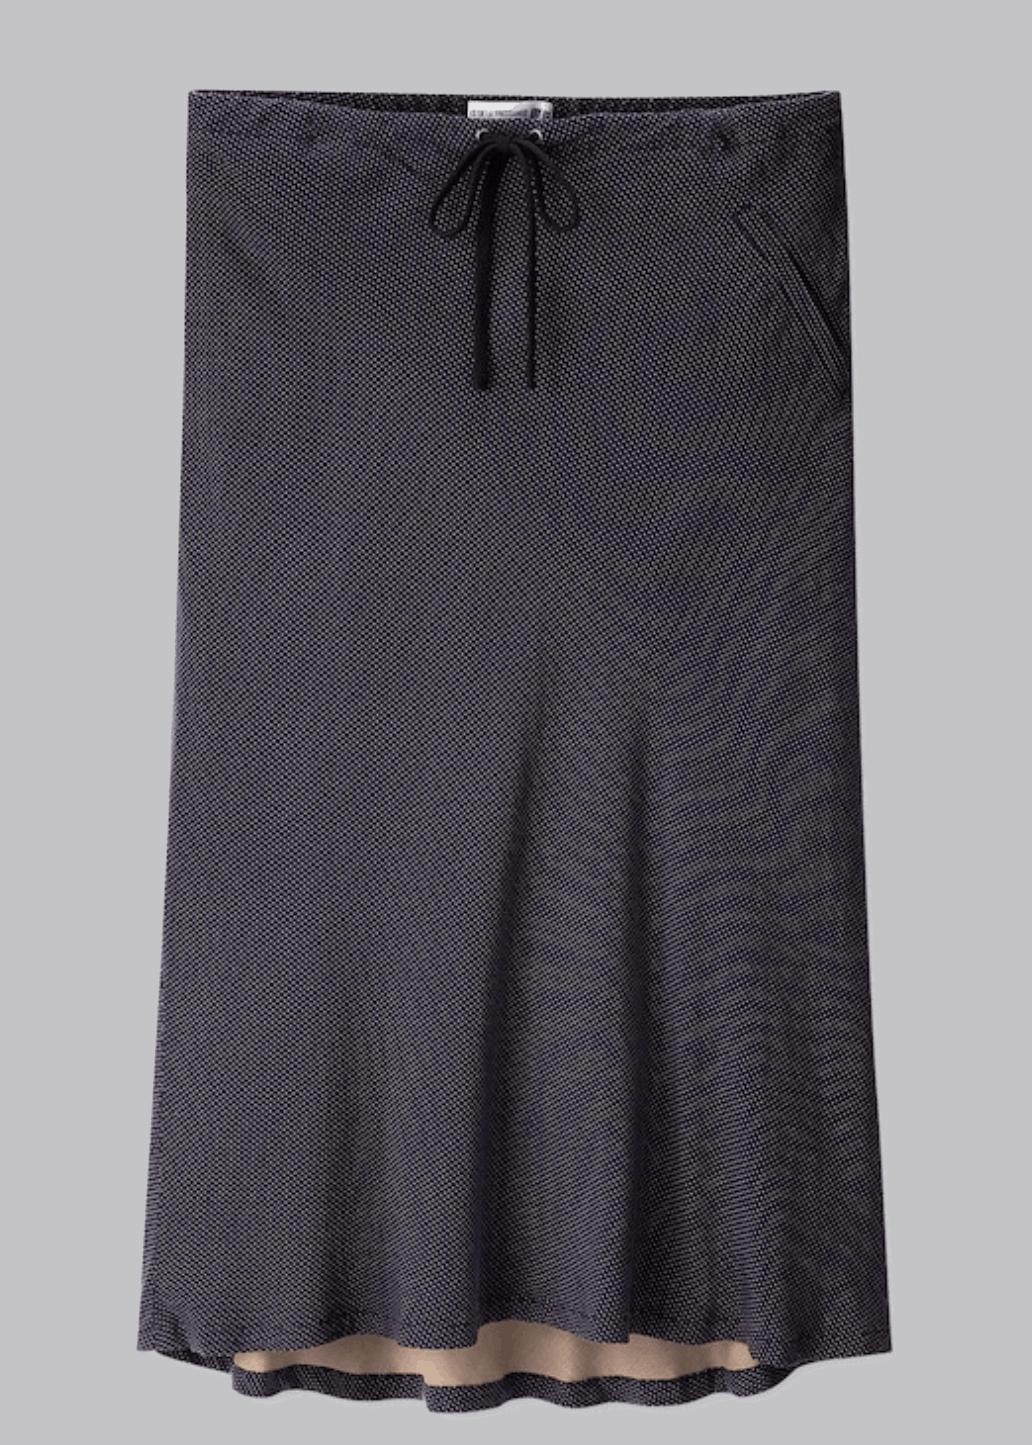 Ines de la Fressange X Uniqlo Printed Skirt